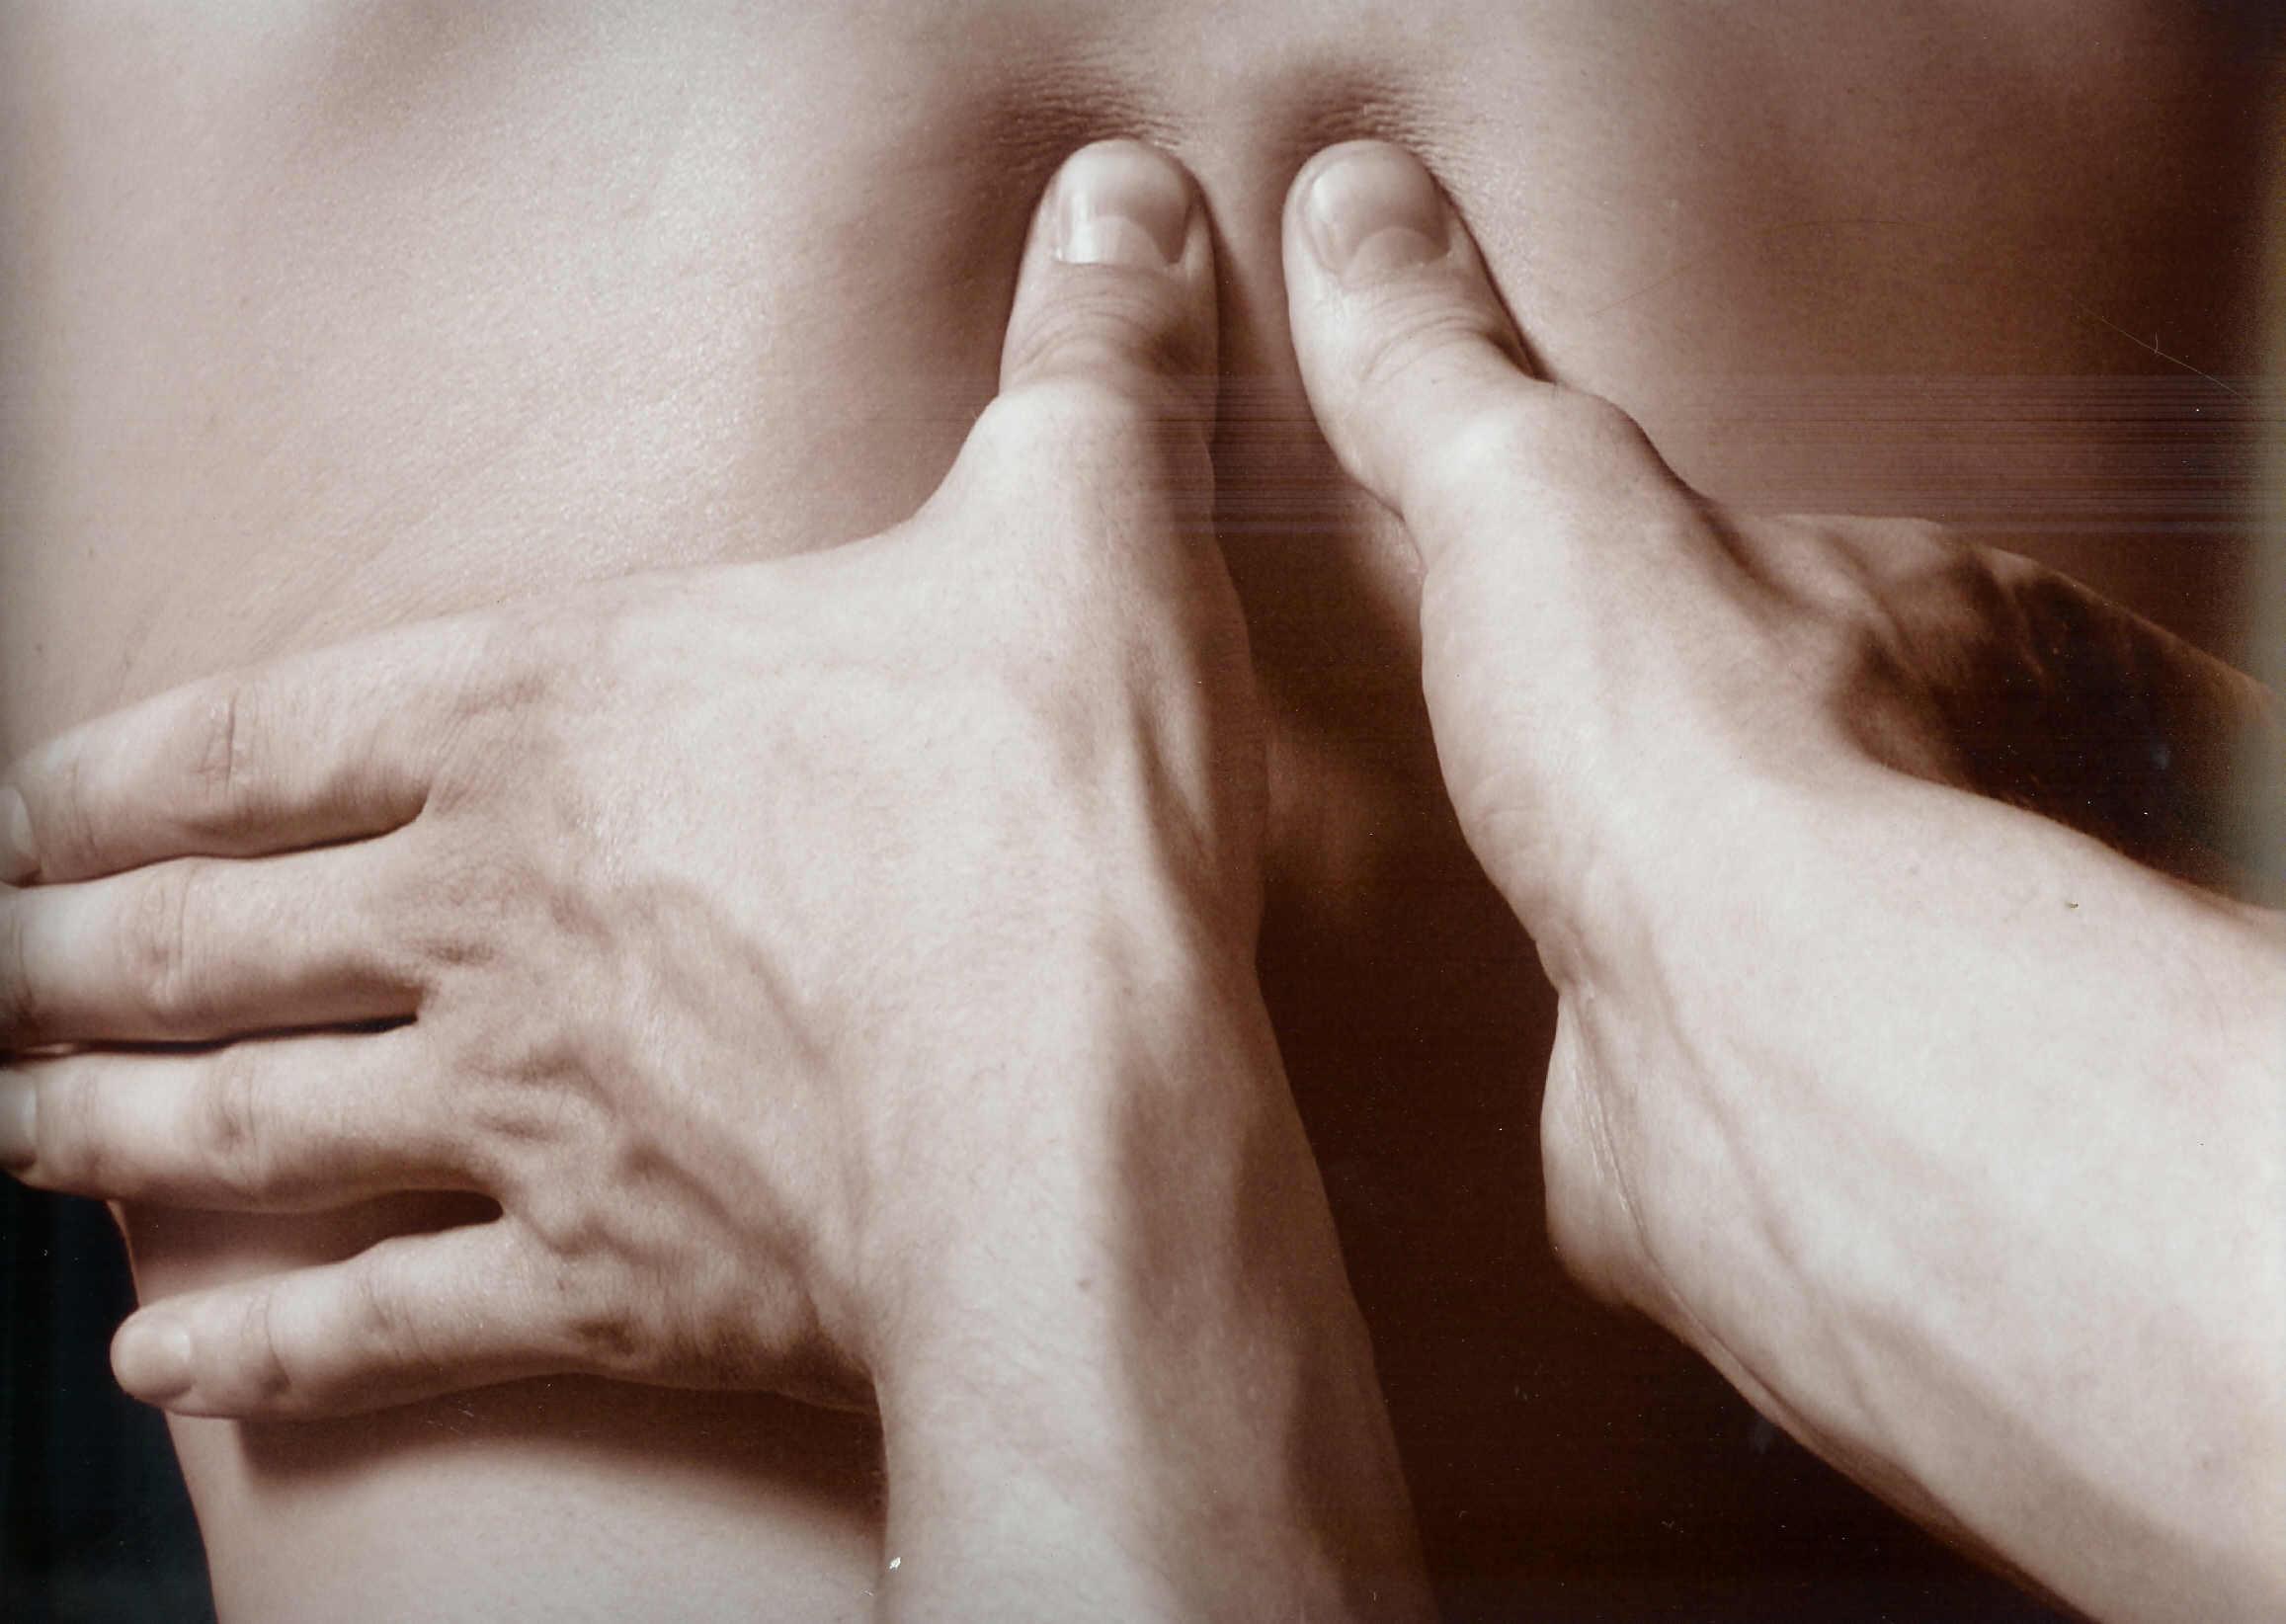 Healing Hands Network